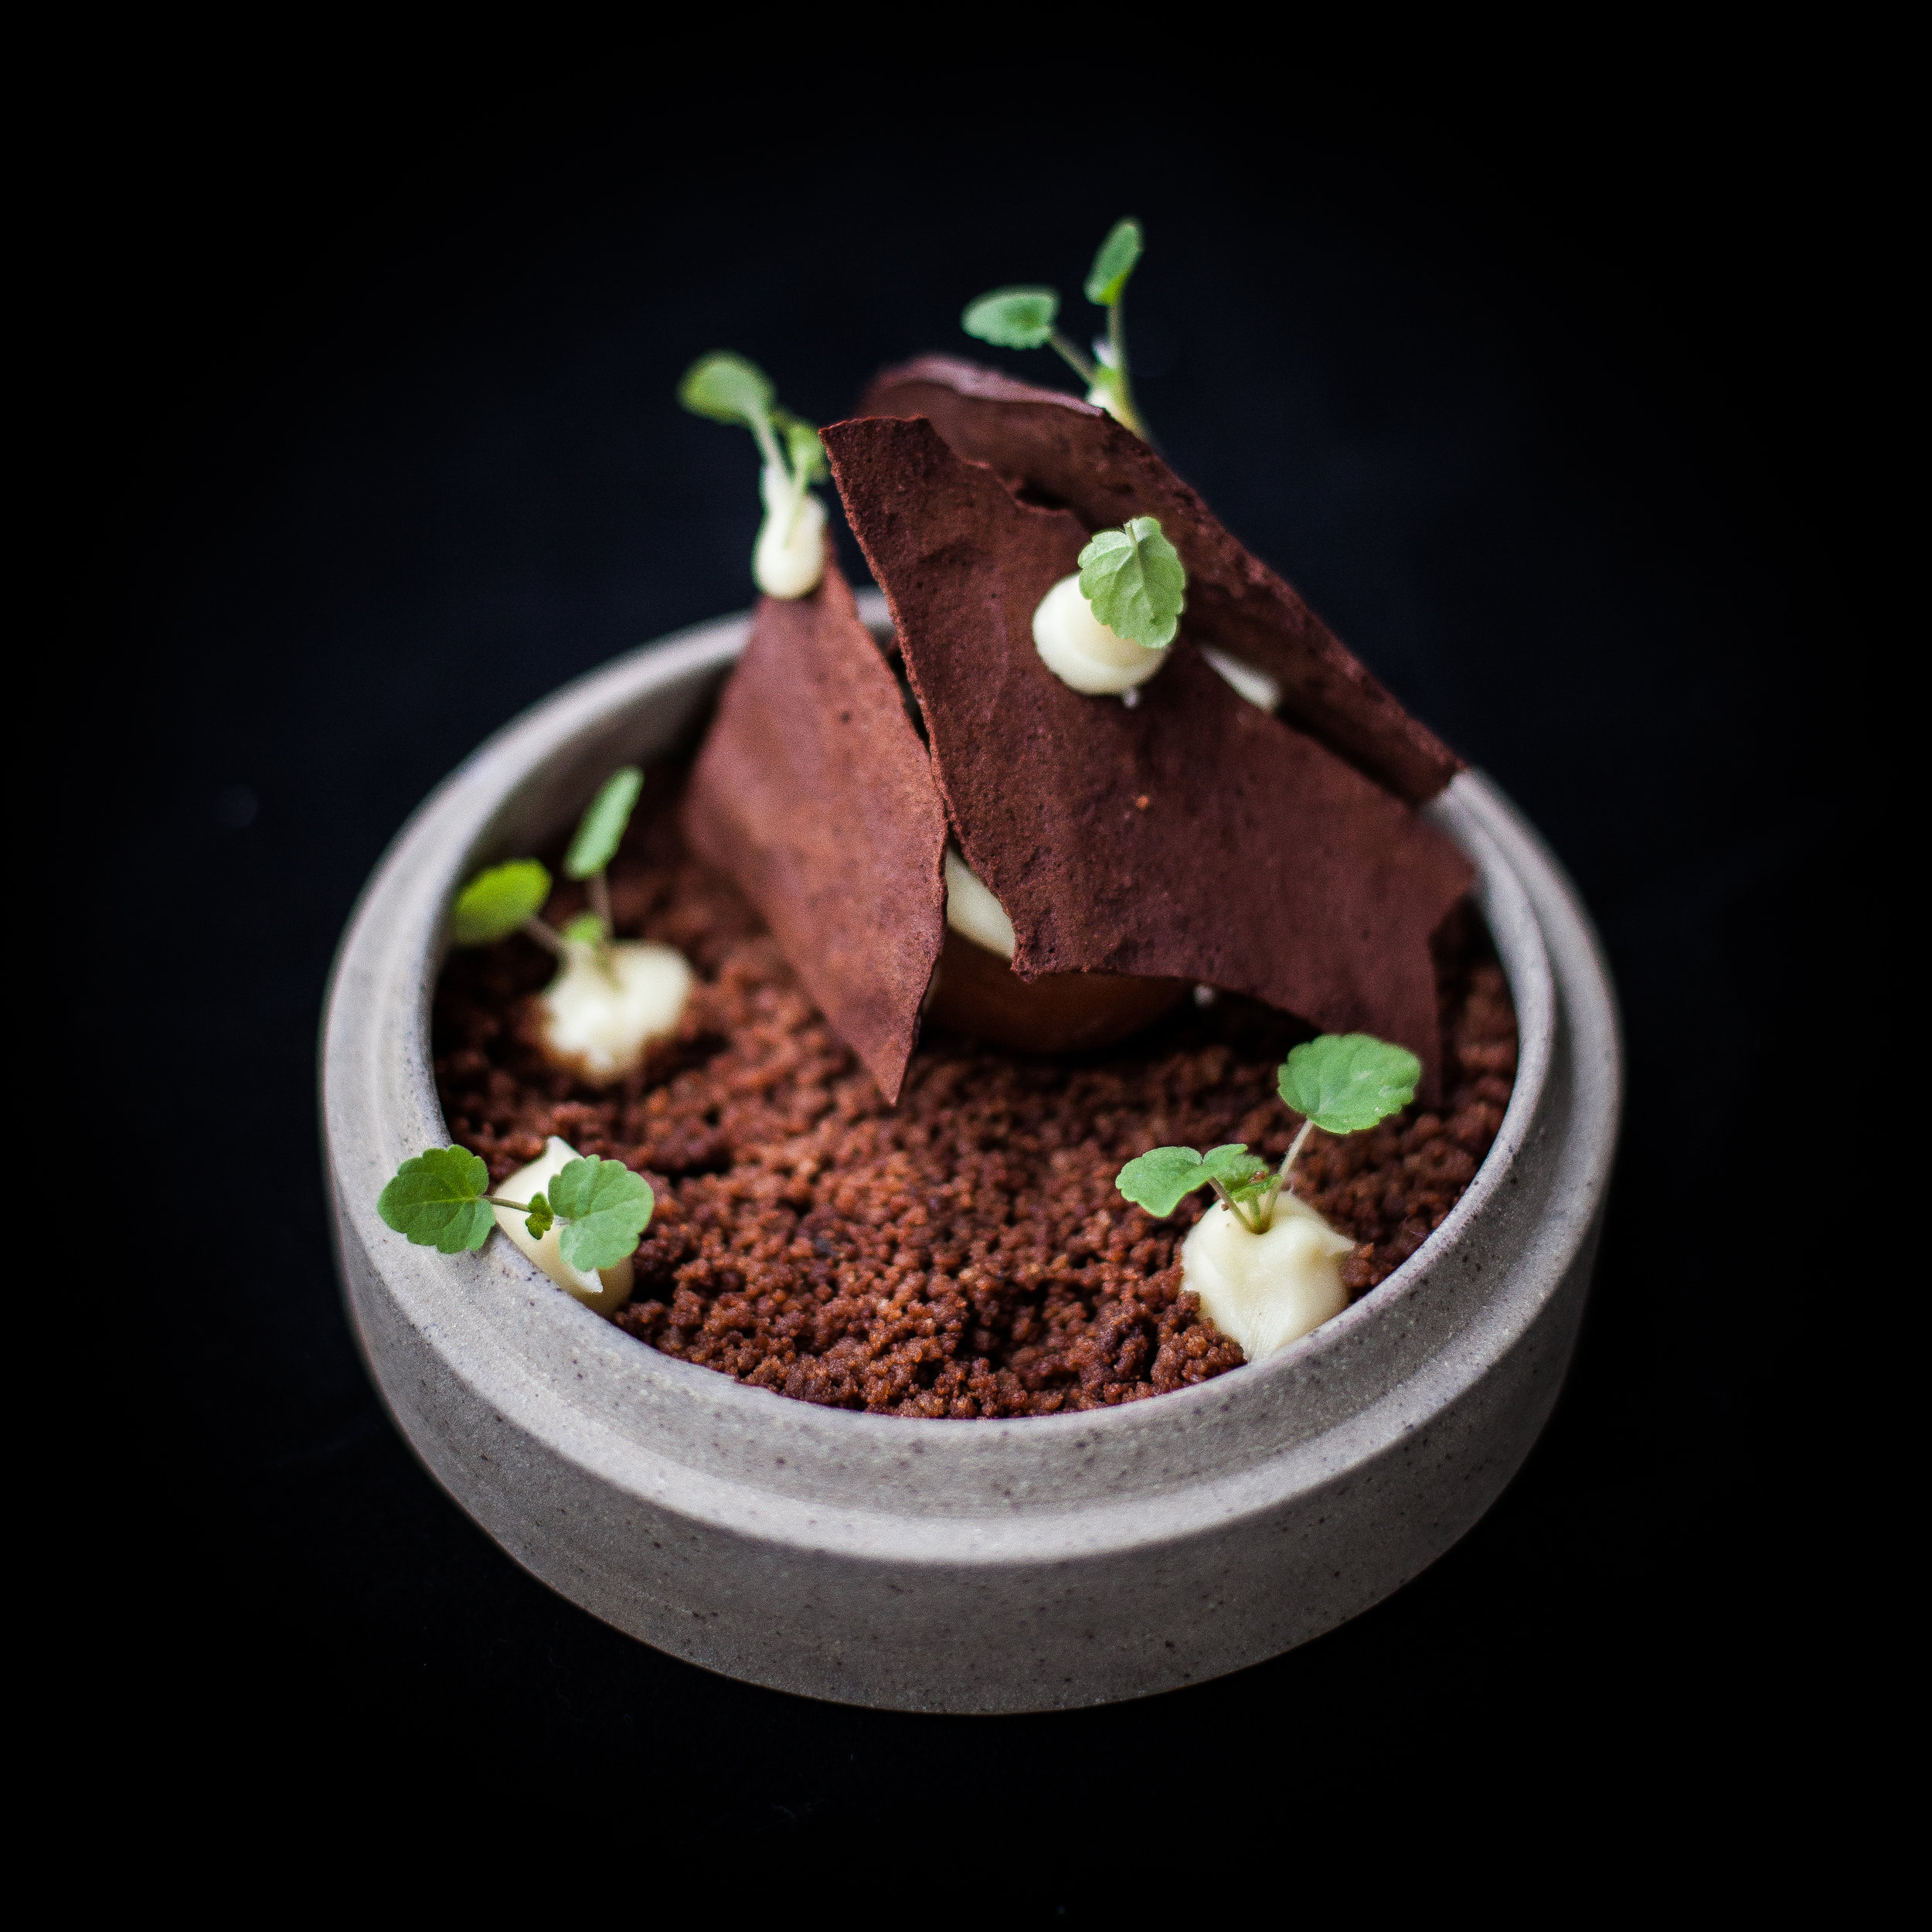 Thirtyfive chcocolate allday -10.jpg